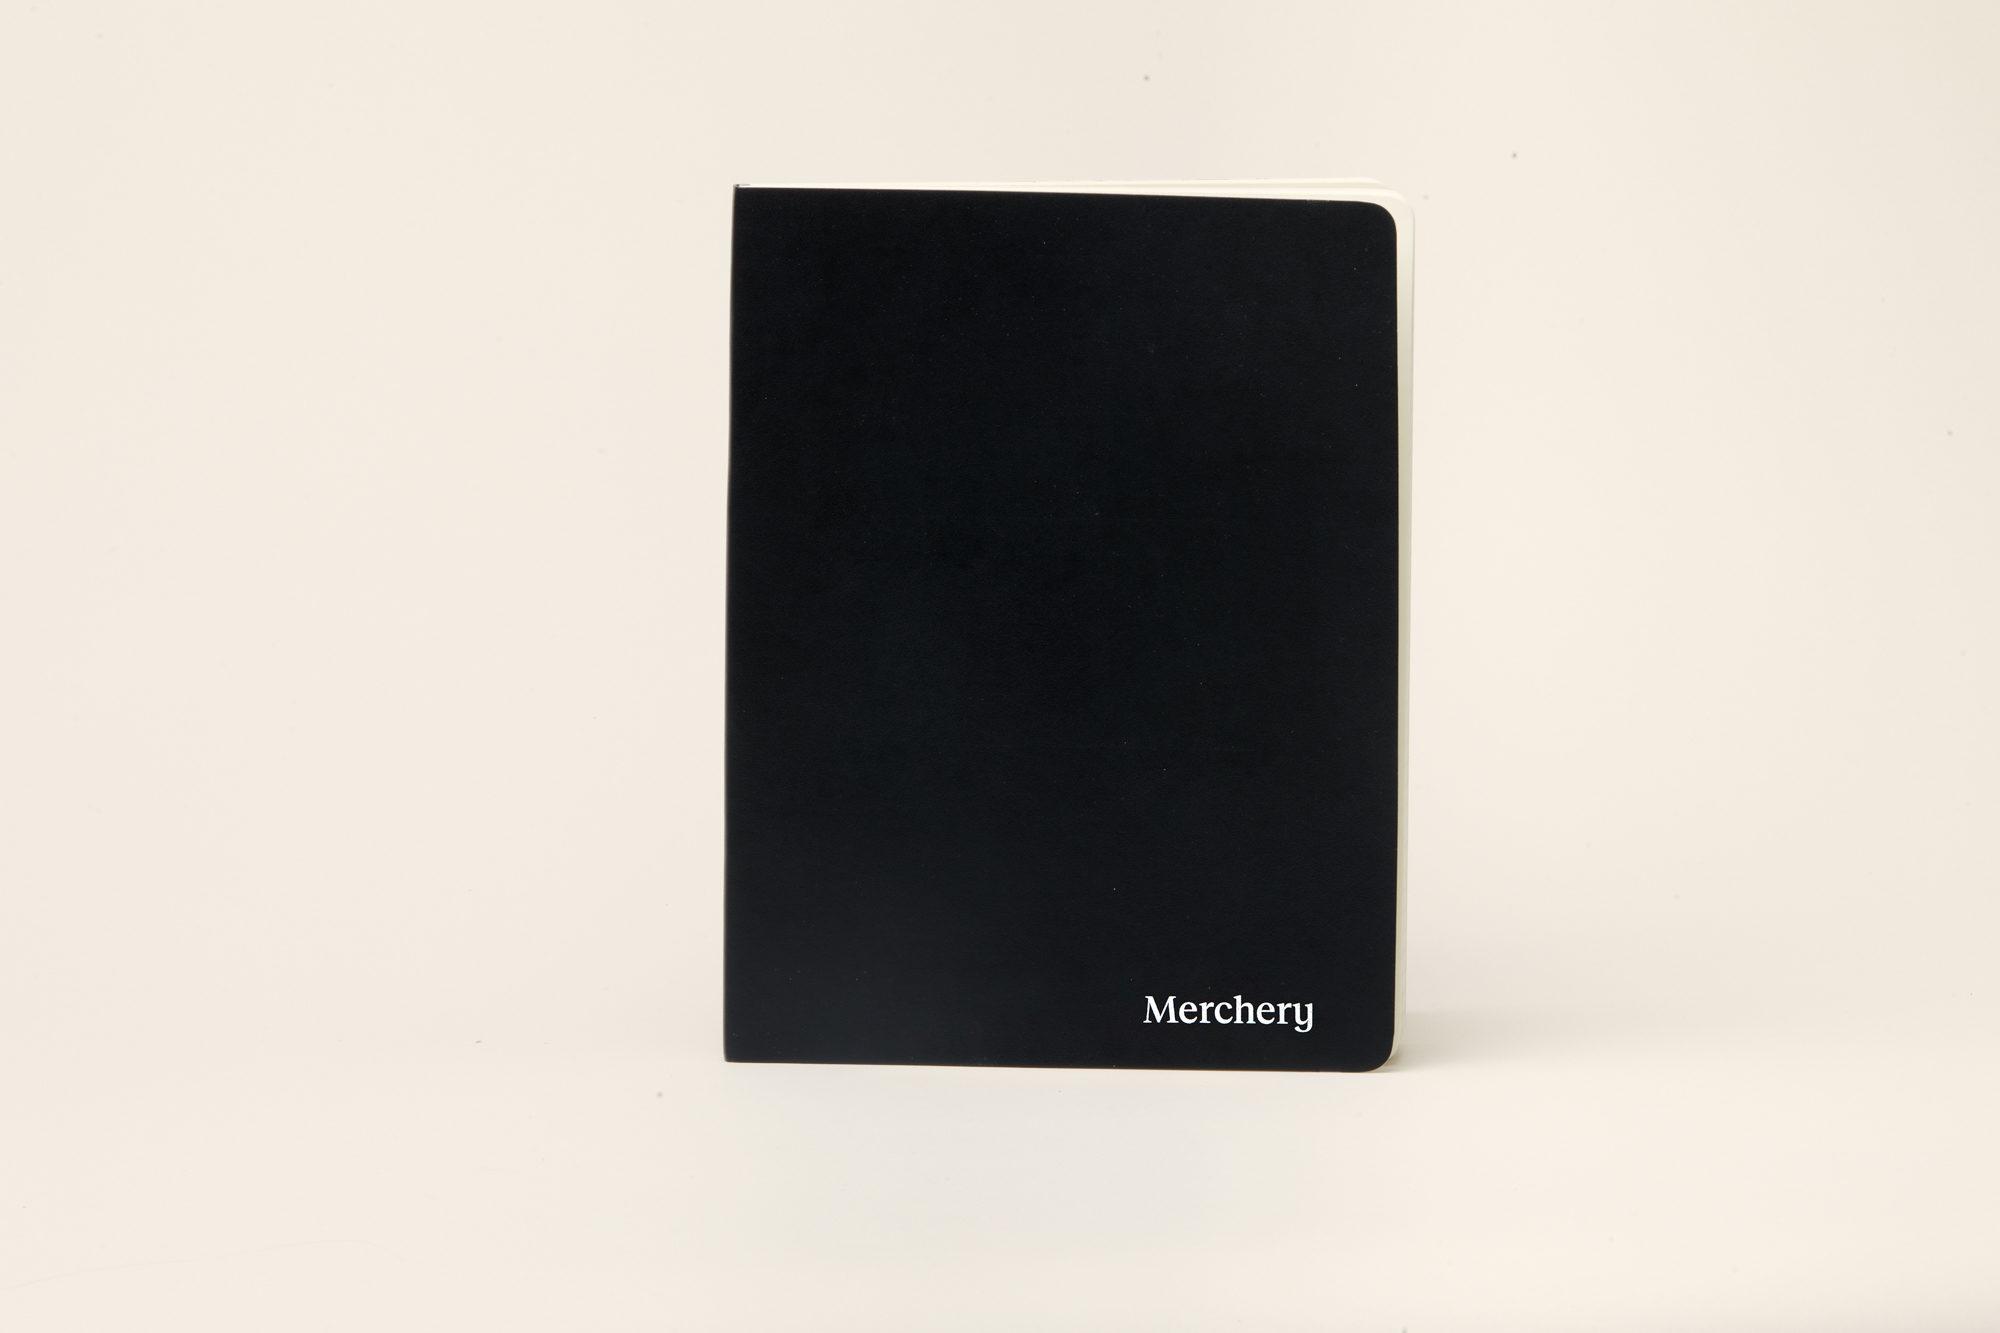 Merchery branded corporate Moleskine XL